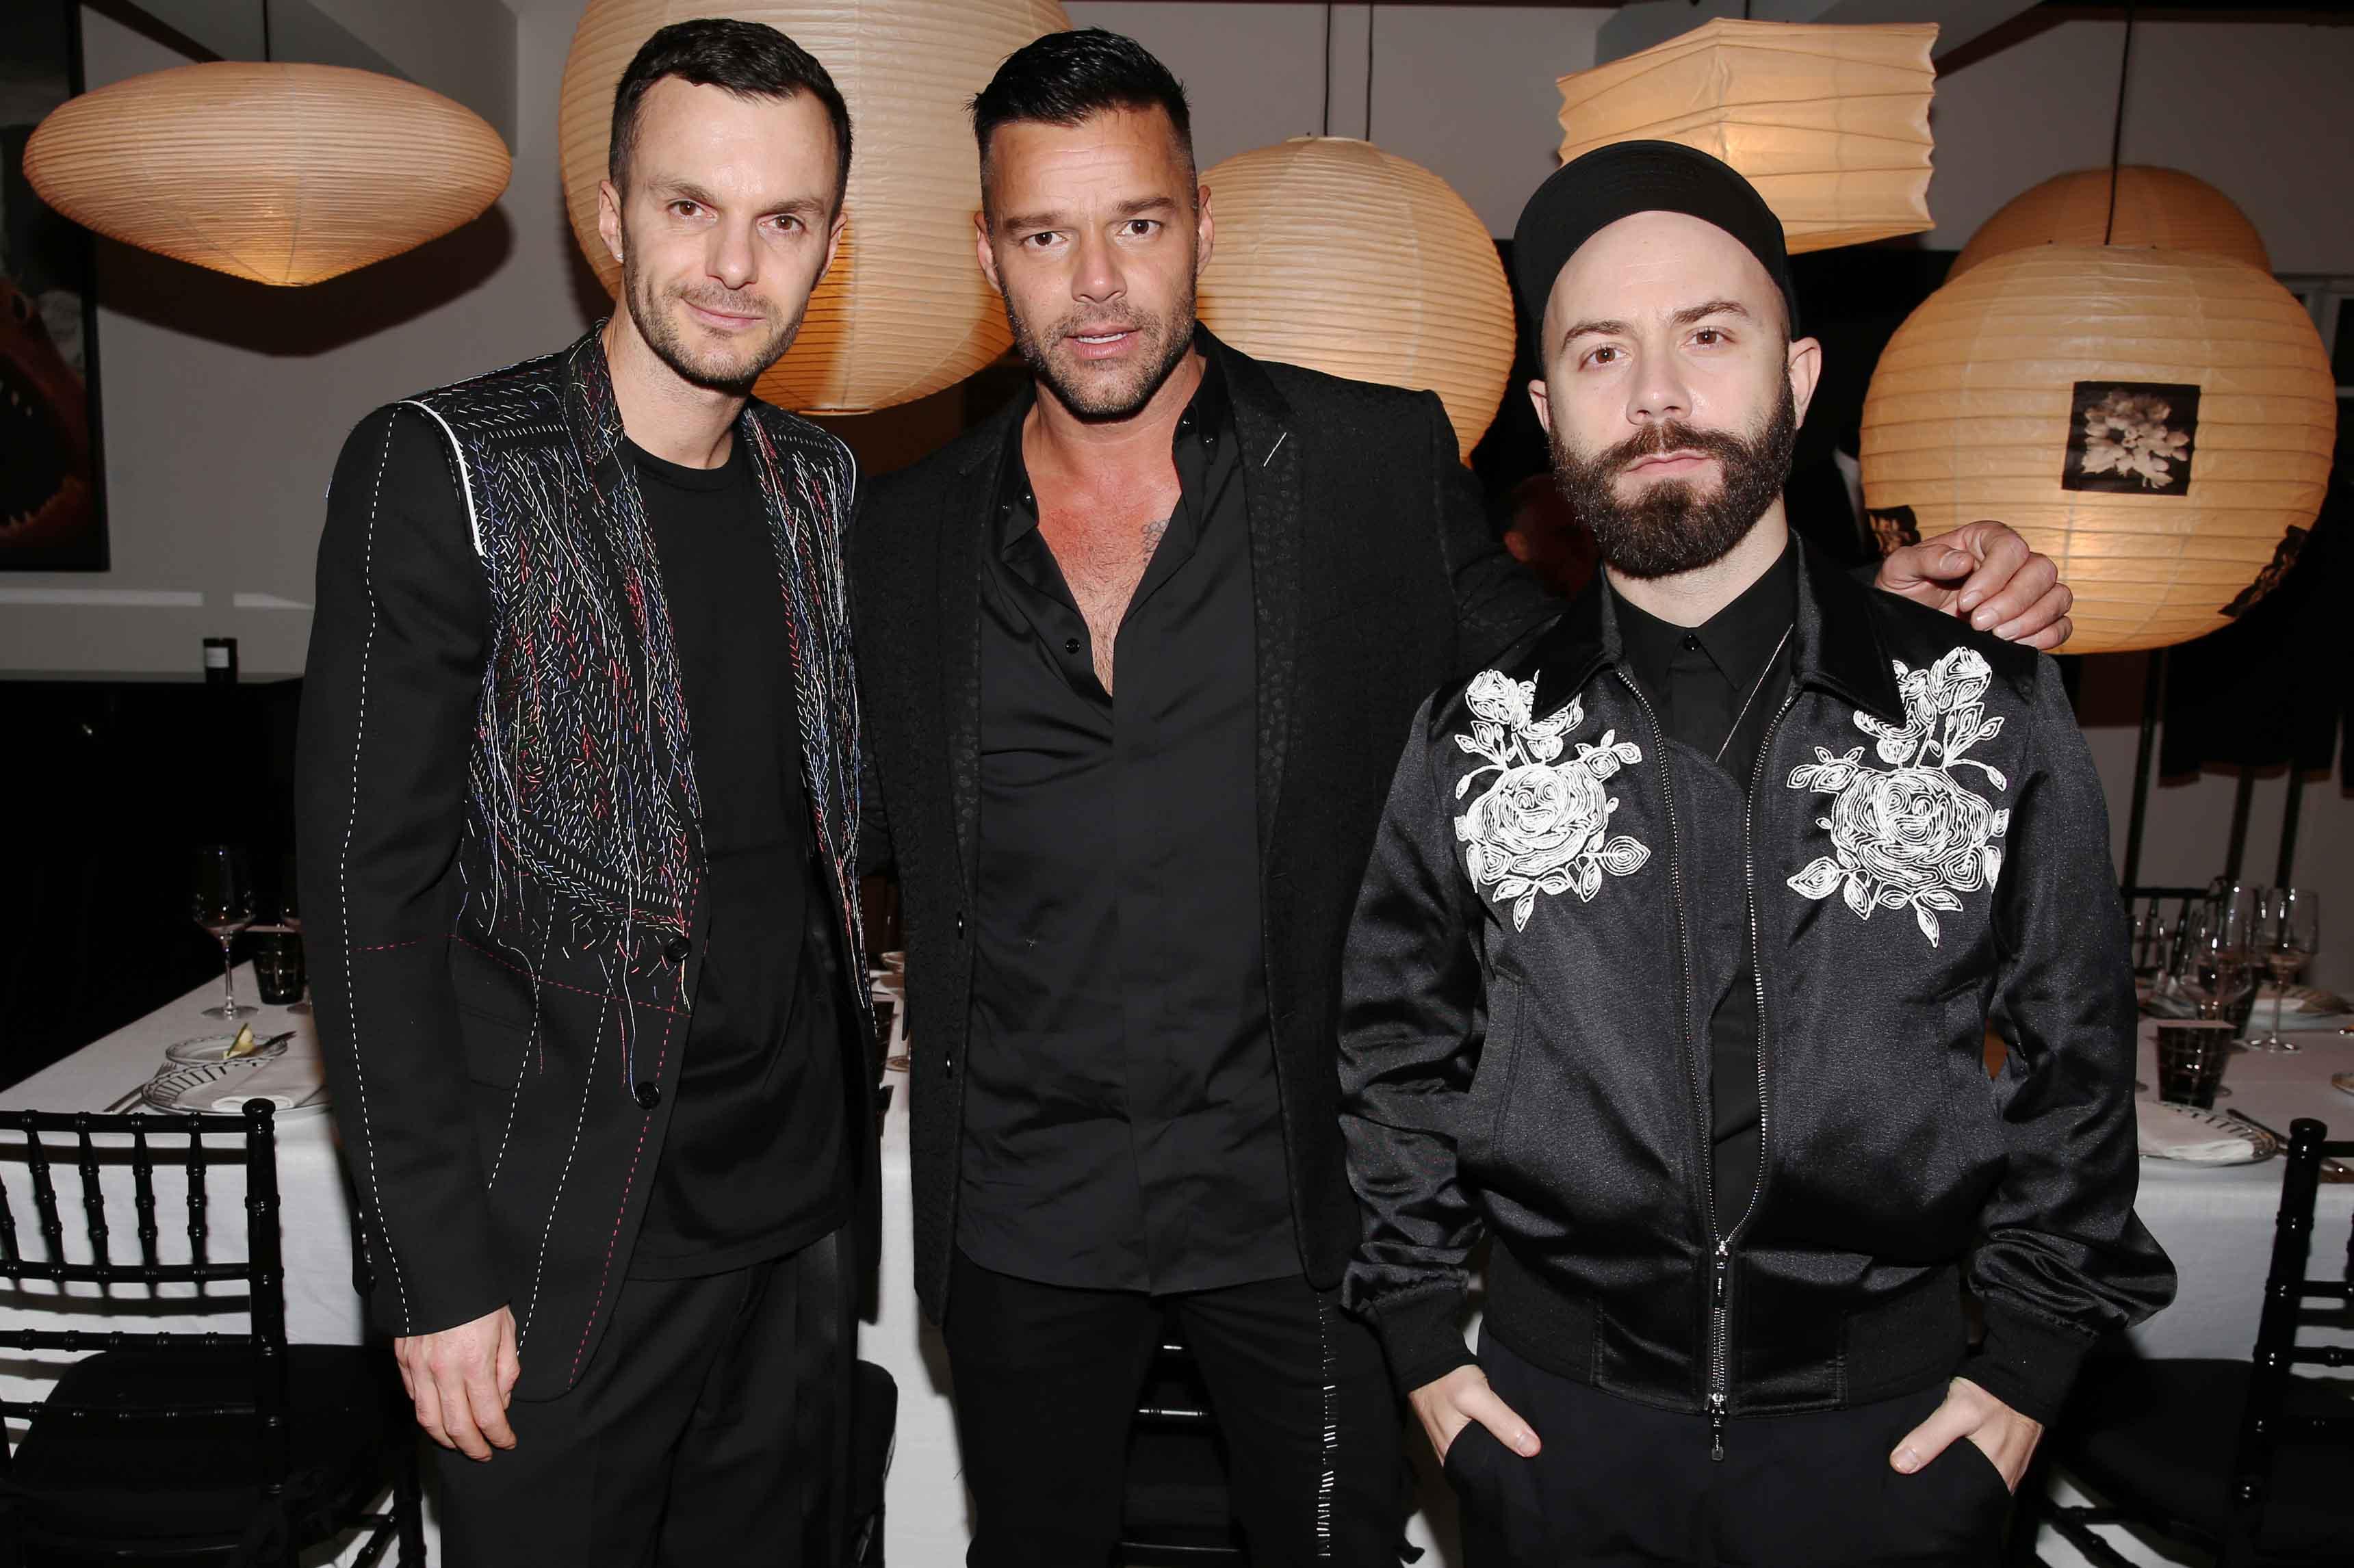 Kris van Assche, Ricky Martin et Woodkid (photo par Saskia Lawaks)